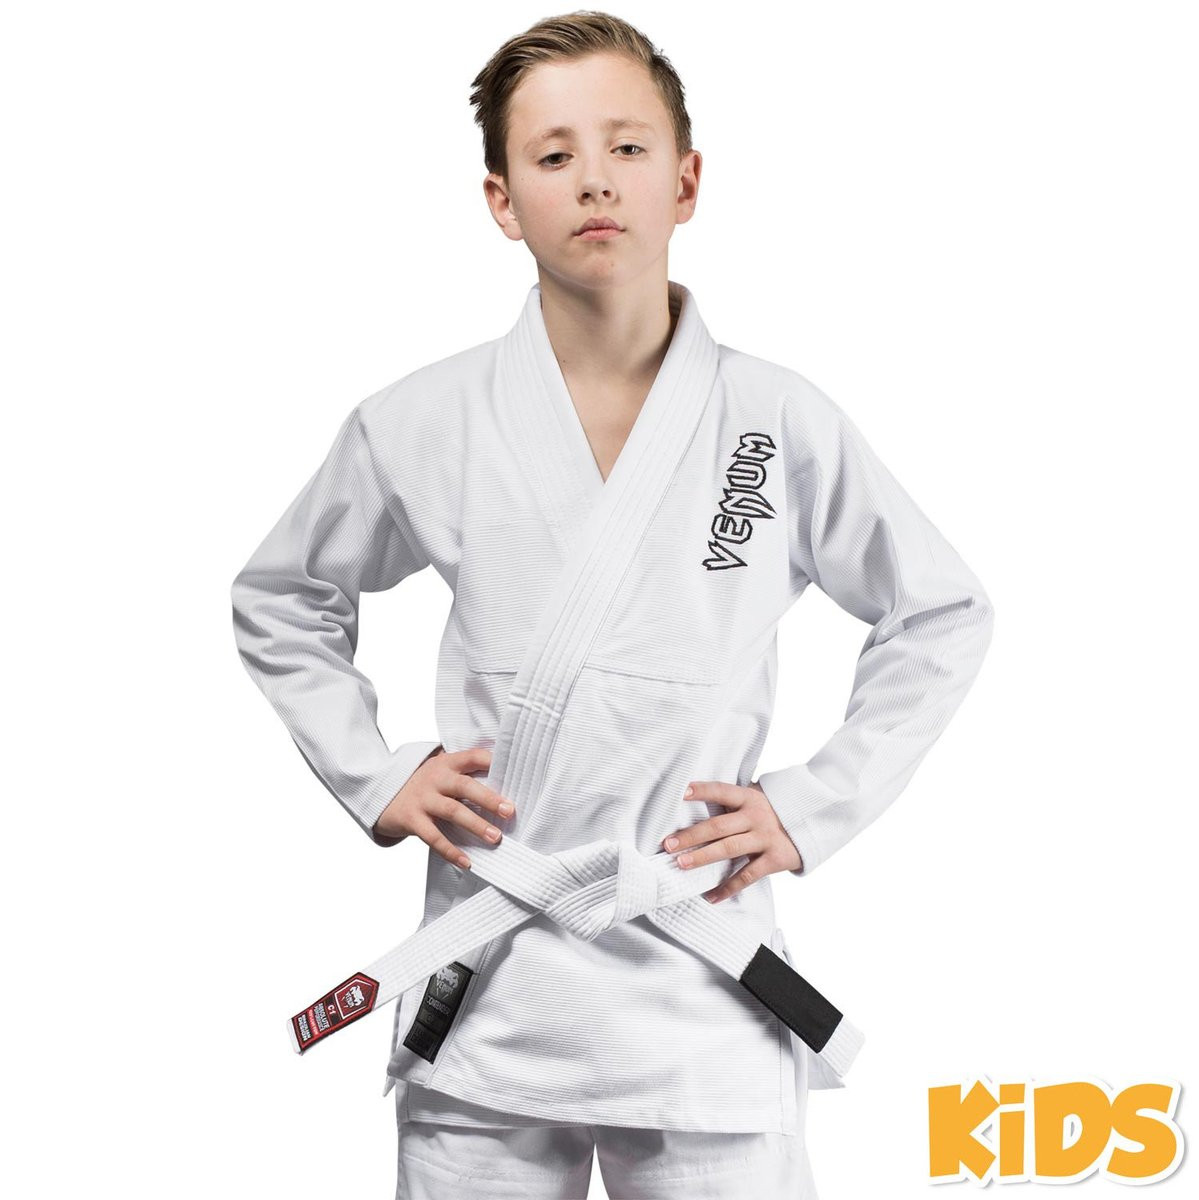 Детское кимоно для бжж contender - white